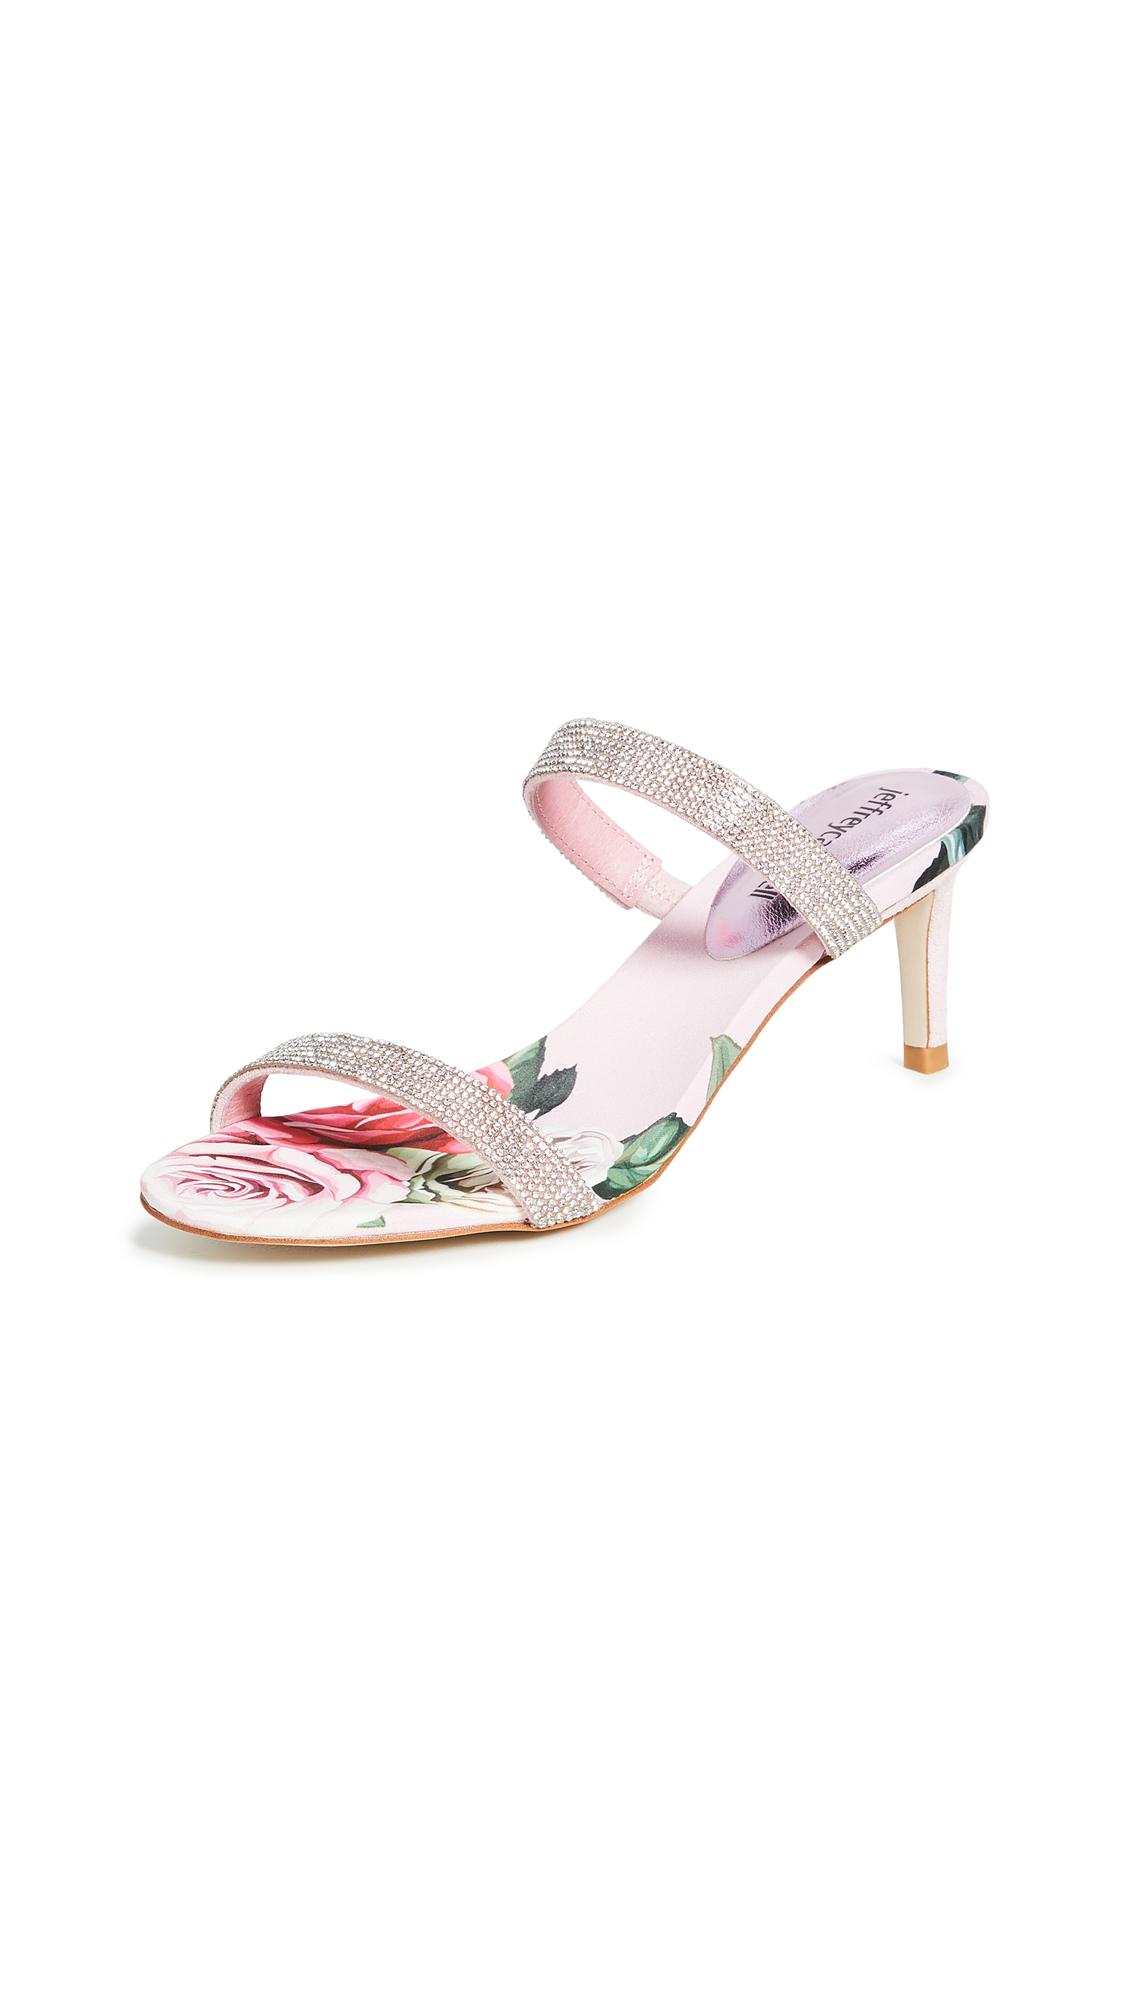 Jeffrey Campbell Royal Sandals - 30% Off Sale